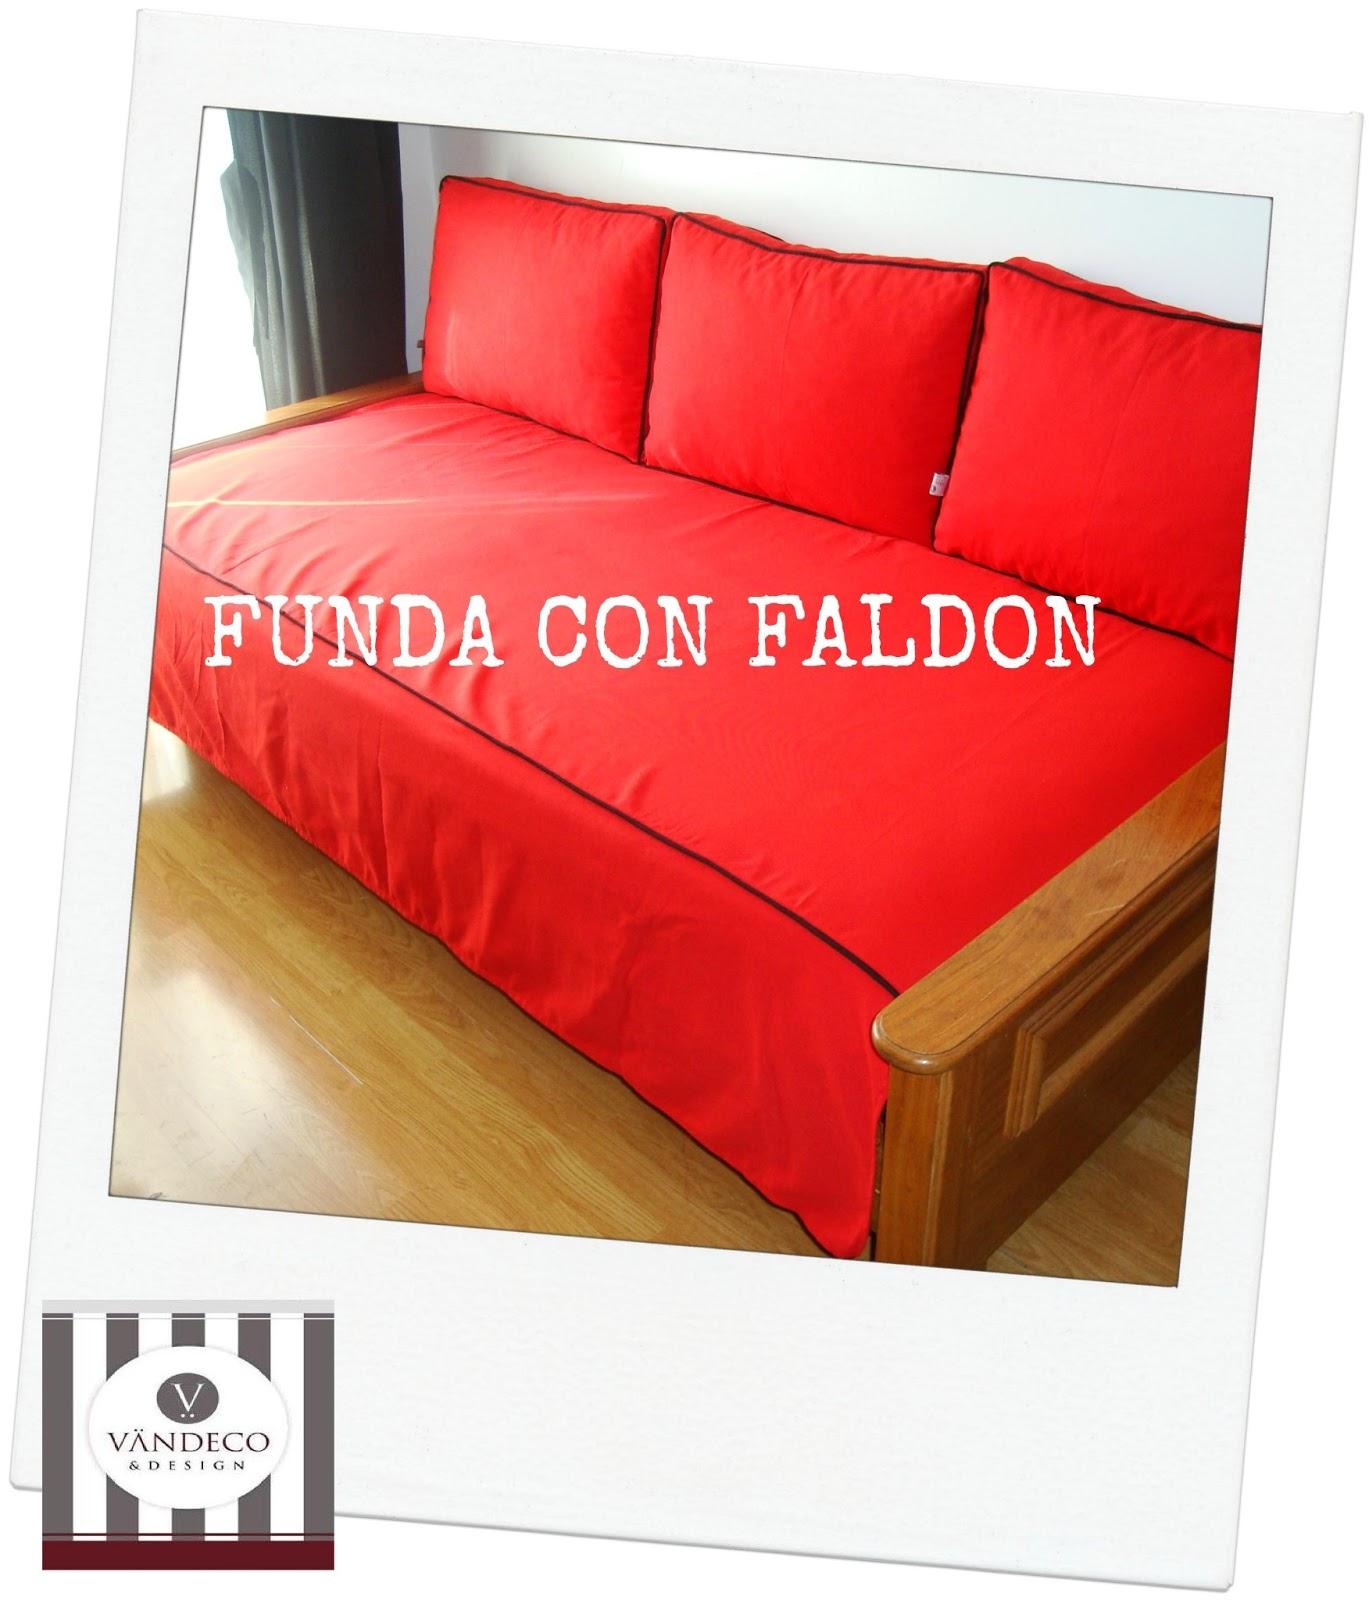 V ndeco design mas ideas de kits para convertir una cama for Sillon de 1 plaza